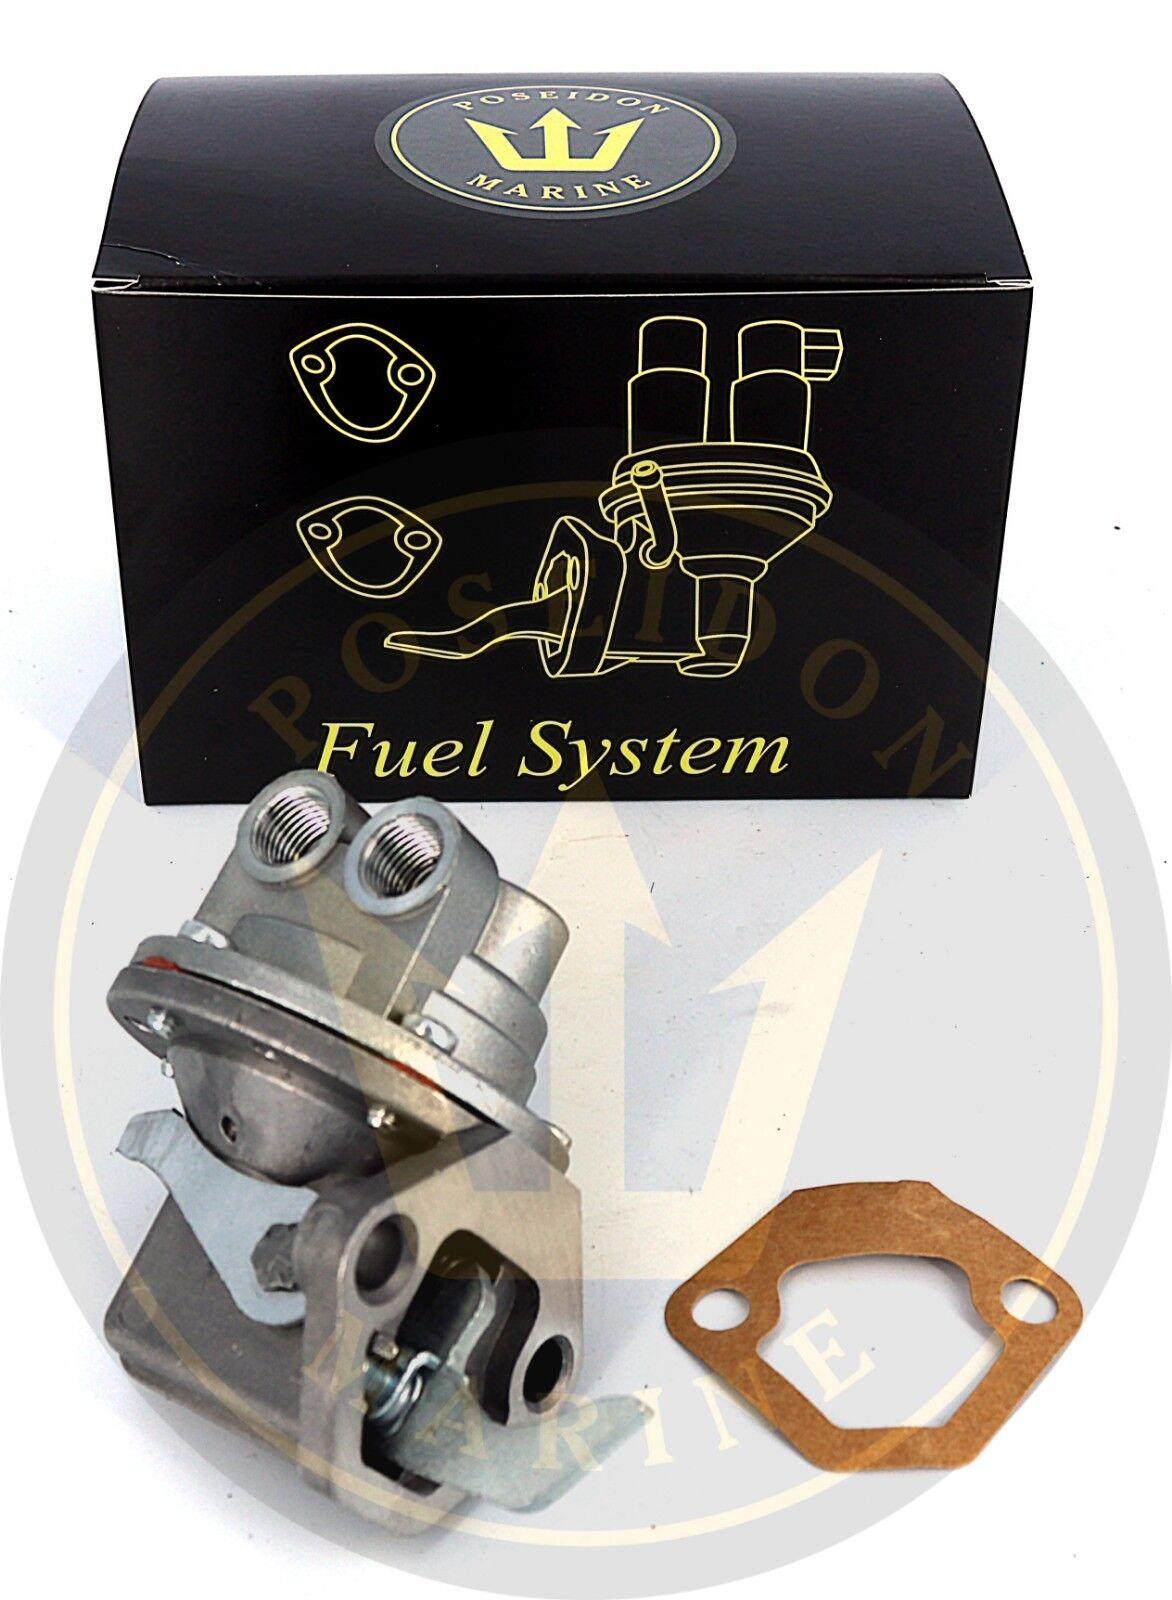 Fuel pump for Solé Sole diesel RO: 13114001 13814005